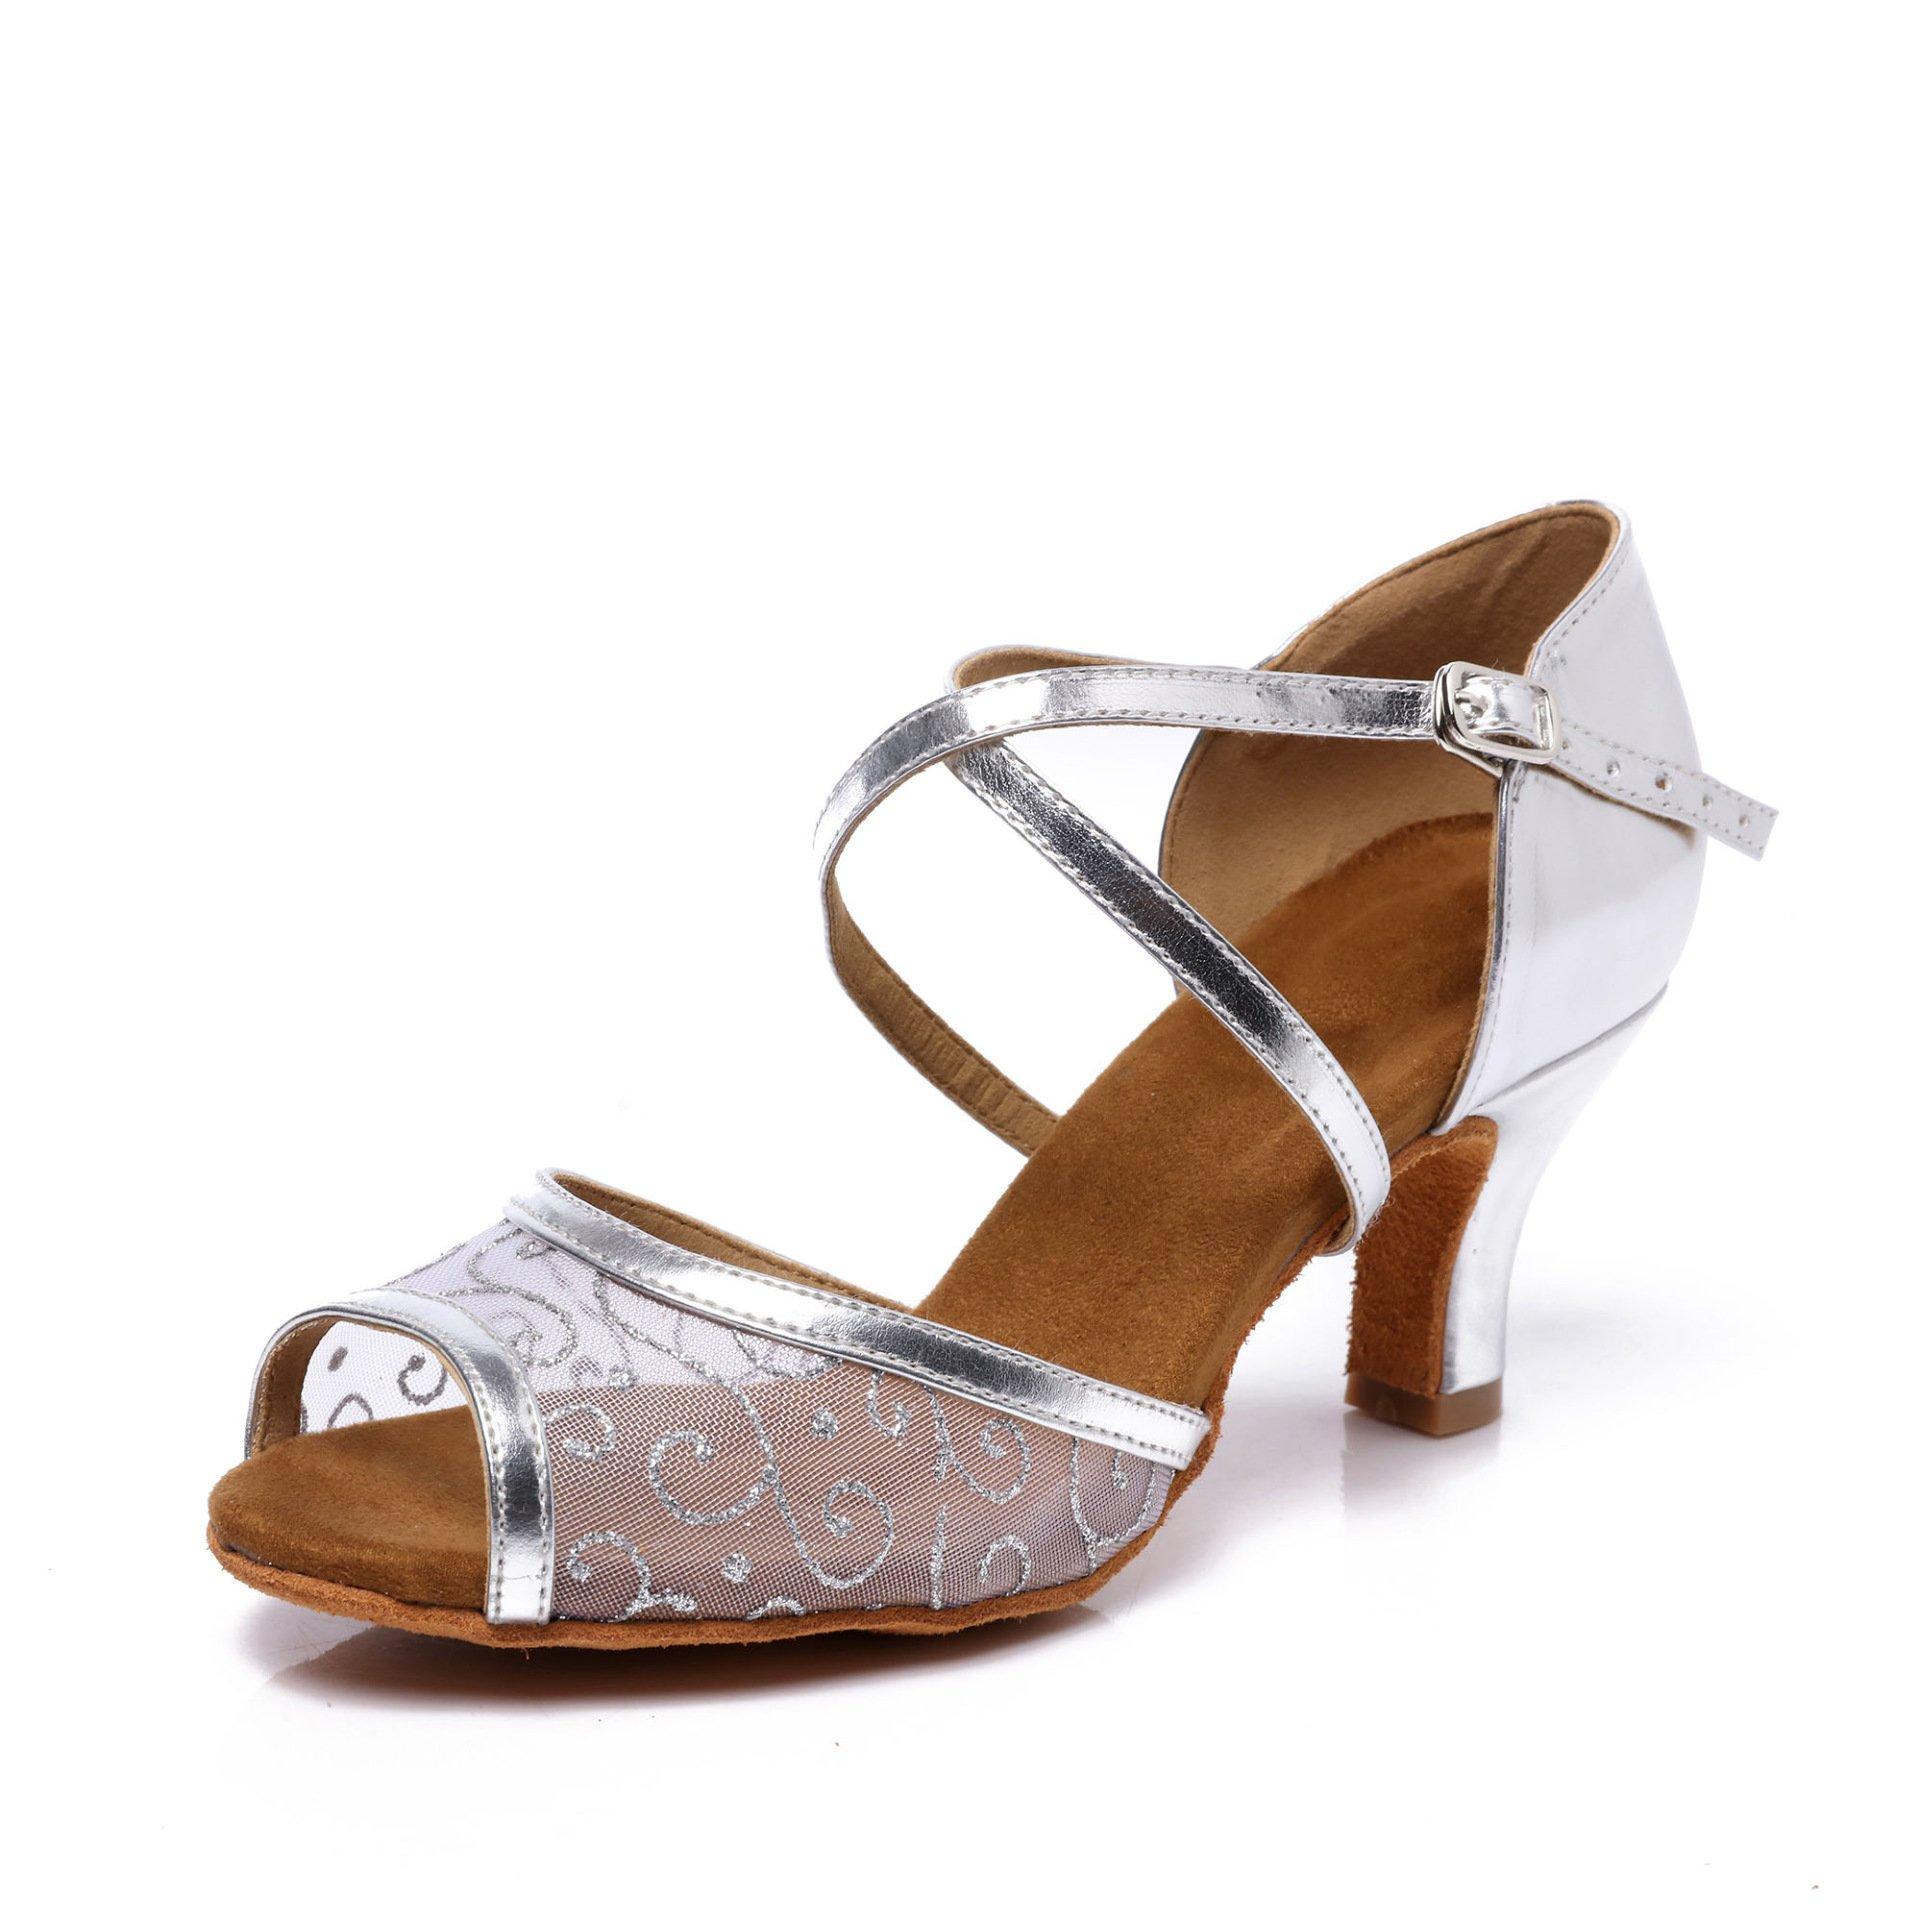 CLEECLI Women Ballroom Dance Shoes for Latin Salsa Tango Cross Strap 2.5'' Heel ZB05(7.5,Silver)